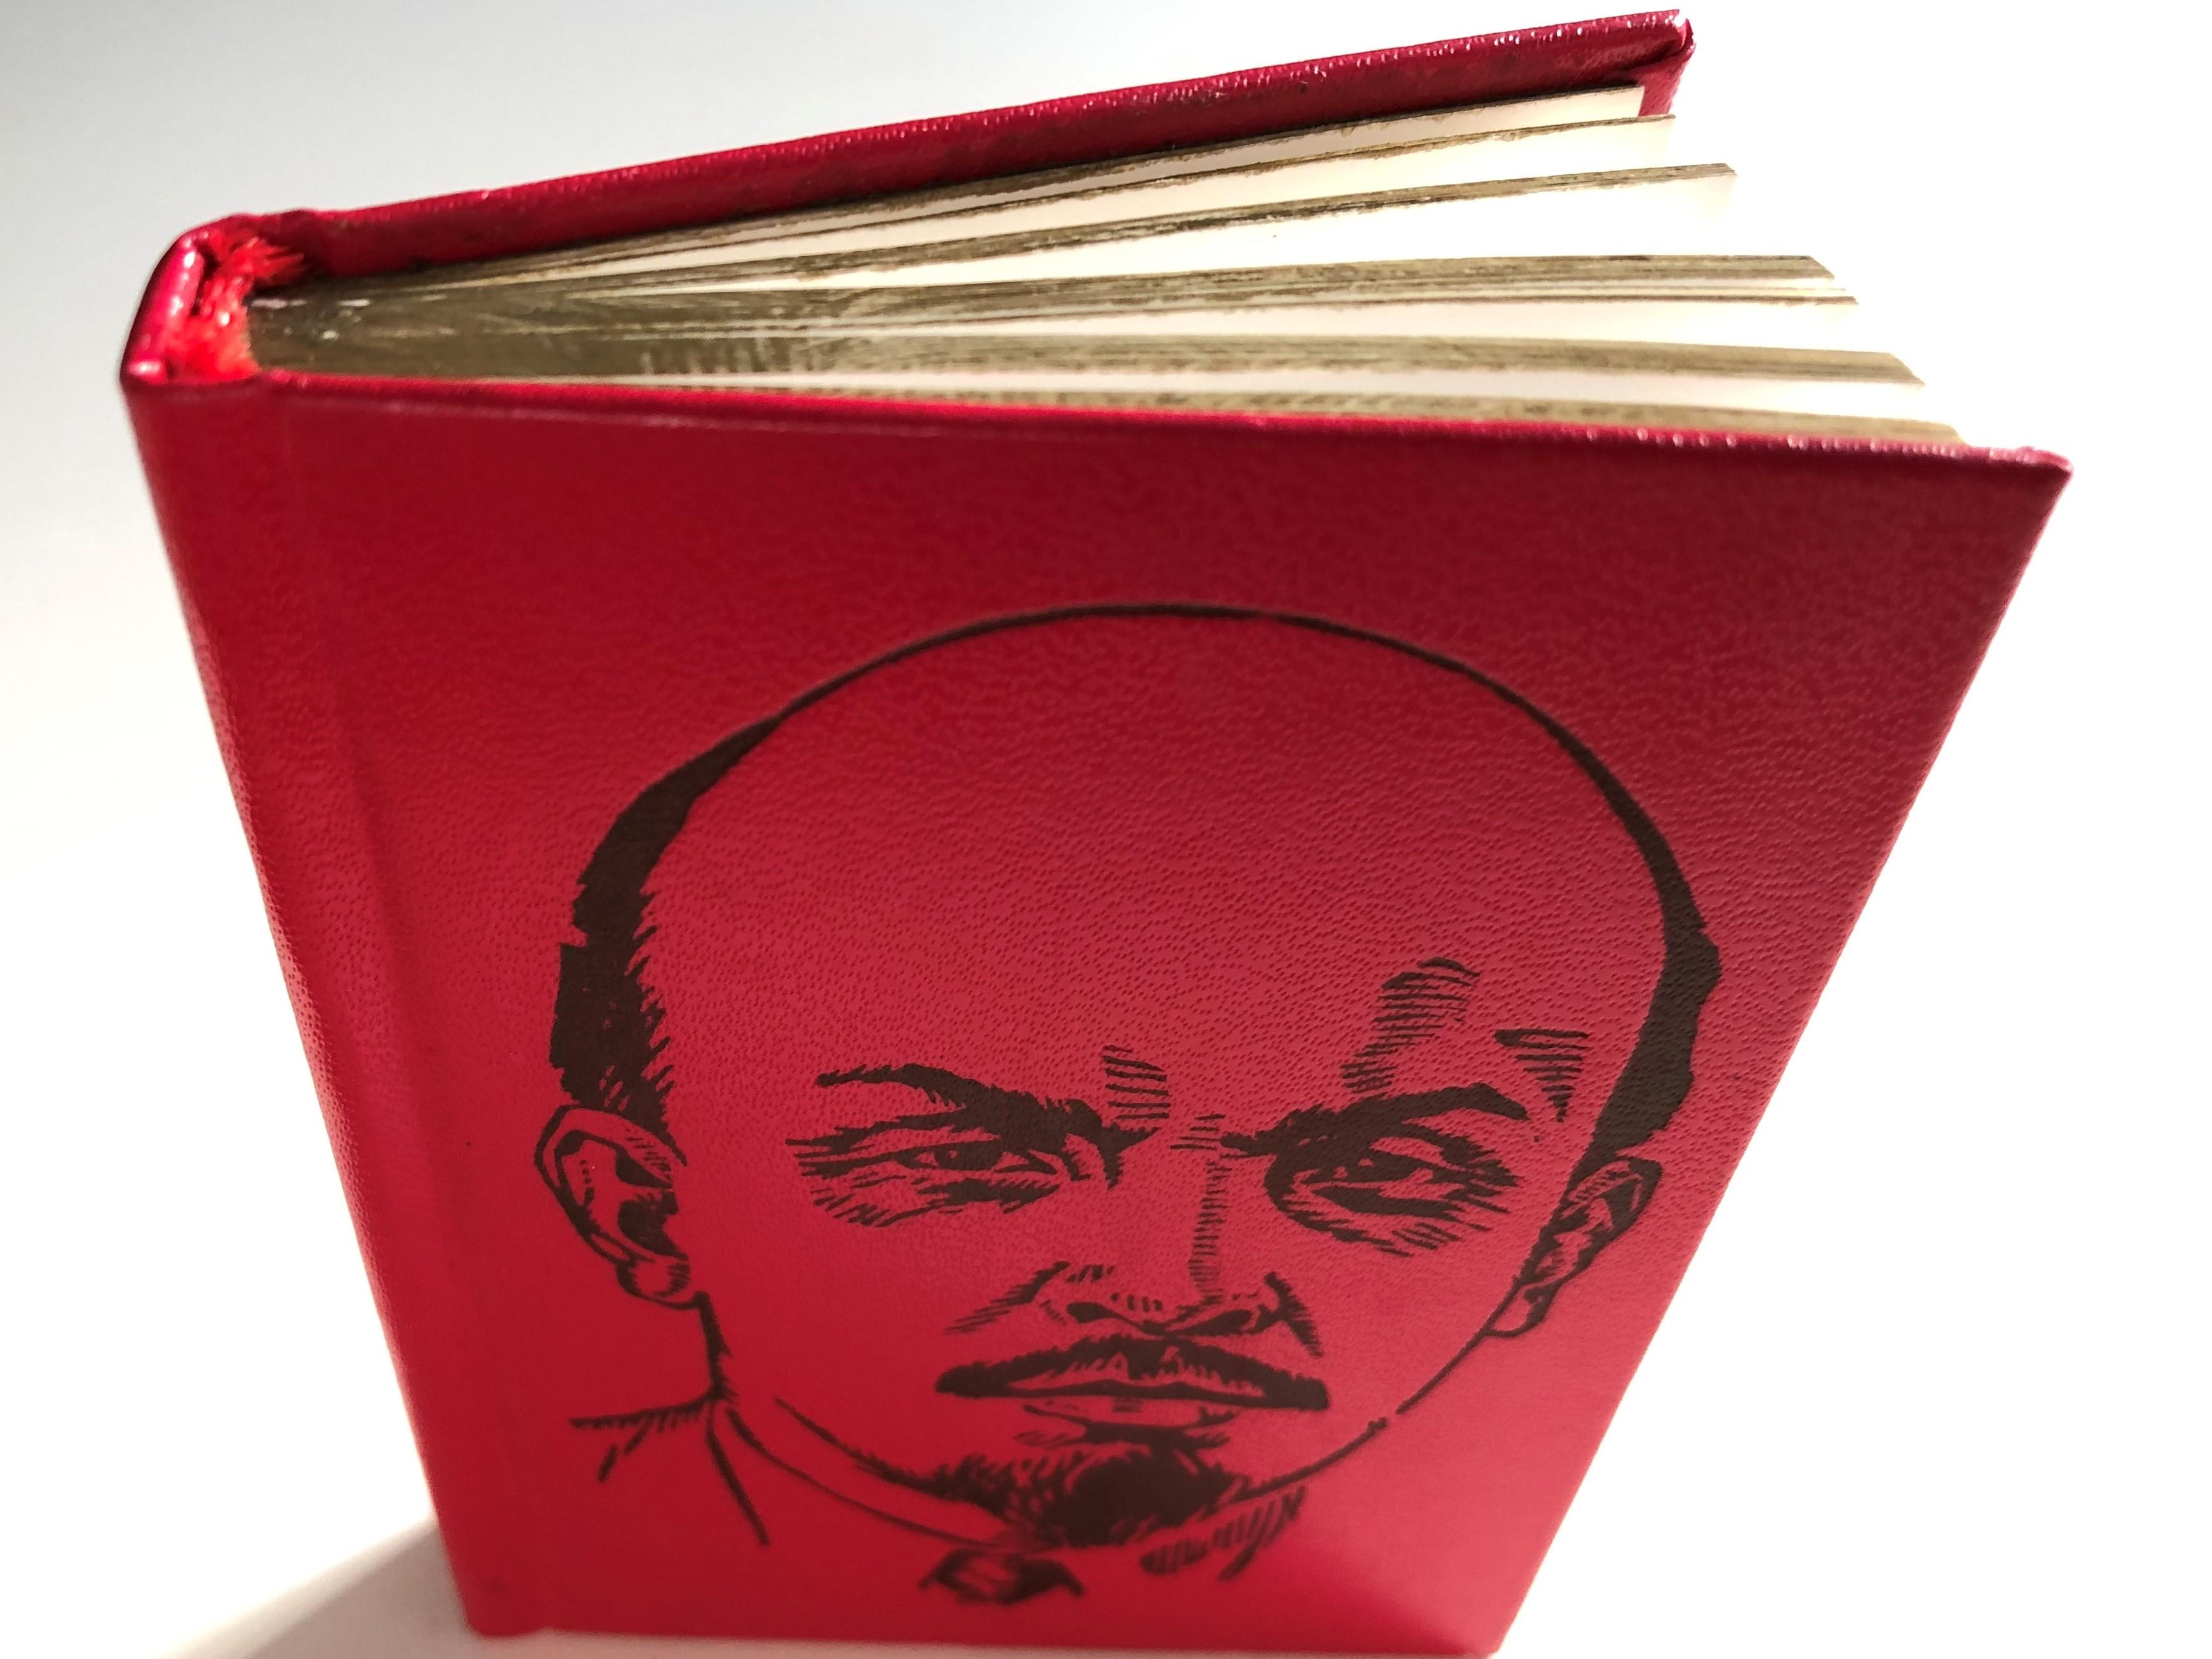 -ukrainian-language-poetry-by-soviet-authors-dedicated-to-lenin-hardcover-golden-edges-pocket-size-i-1975-16-.jpg